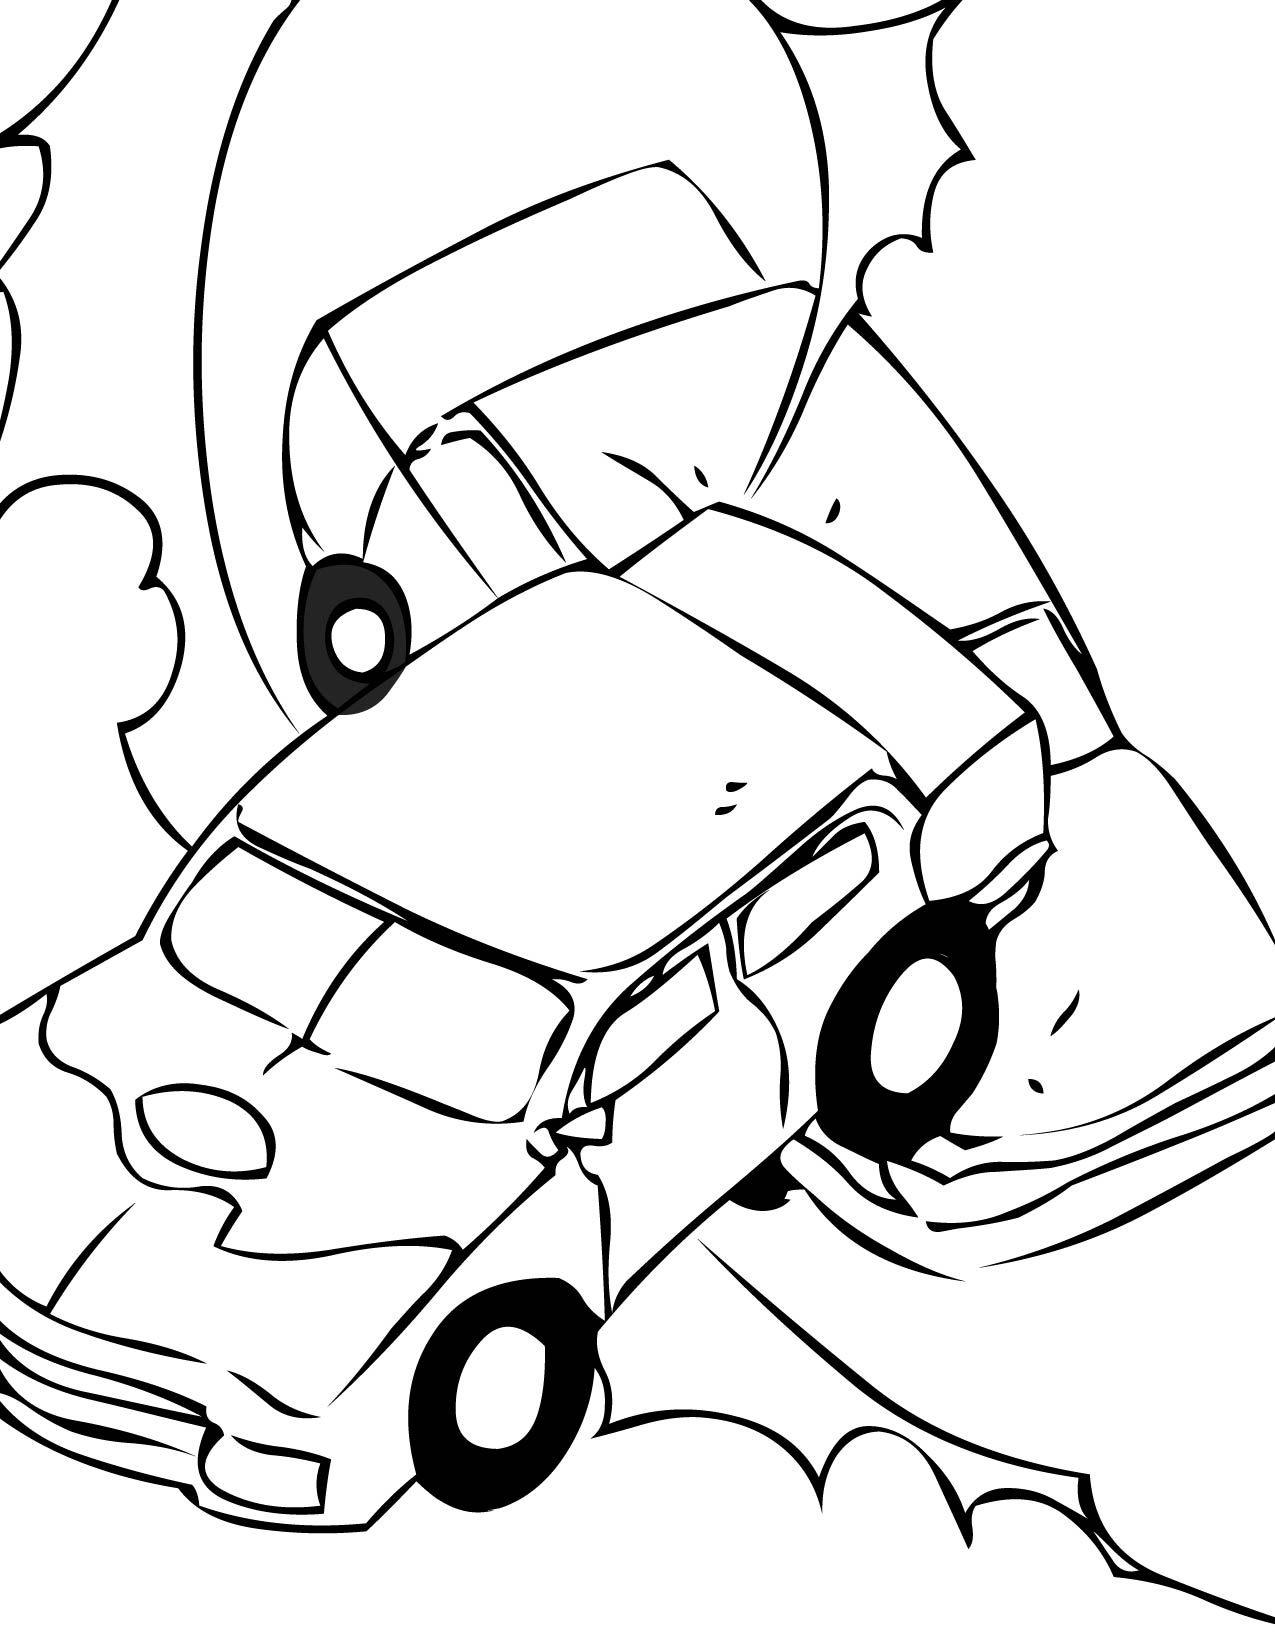 1275x1650 Trend Demolition Derby Car Coloring Pages Inte